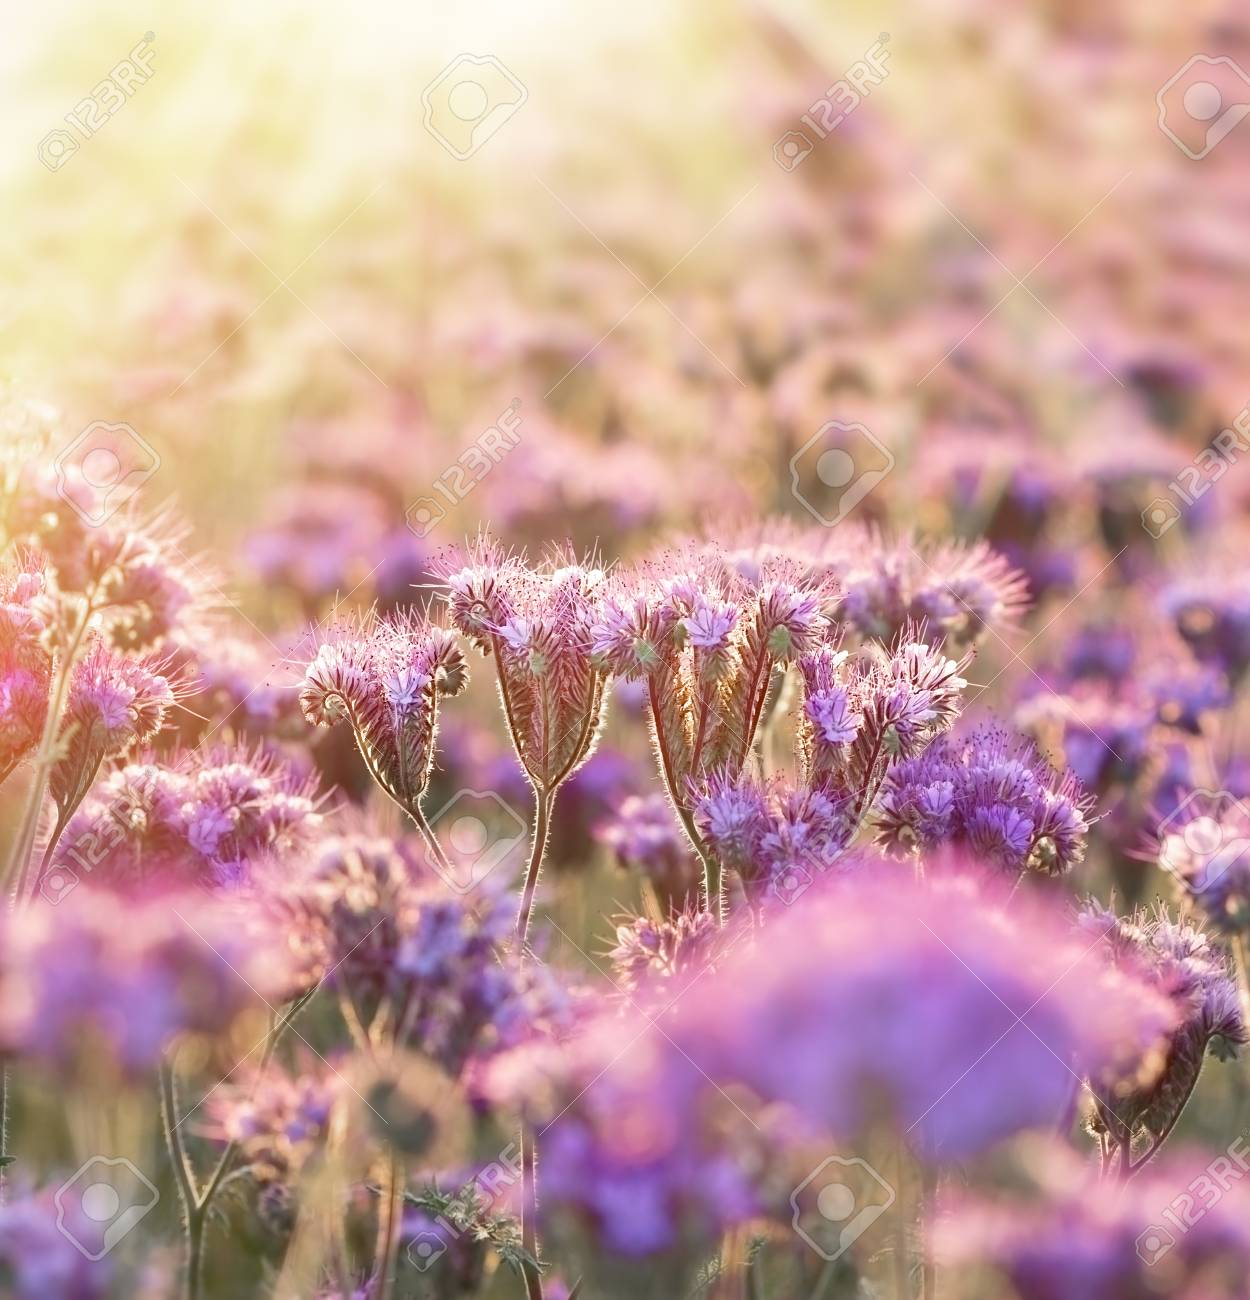 Beautiful purple flowers unusual flower stock photo picture and beautiful purple flowers unusual flower stock photo 54642004 izmirmasajfo